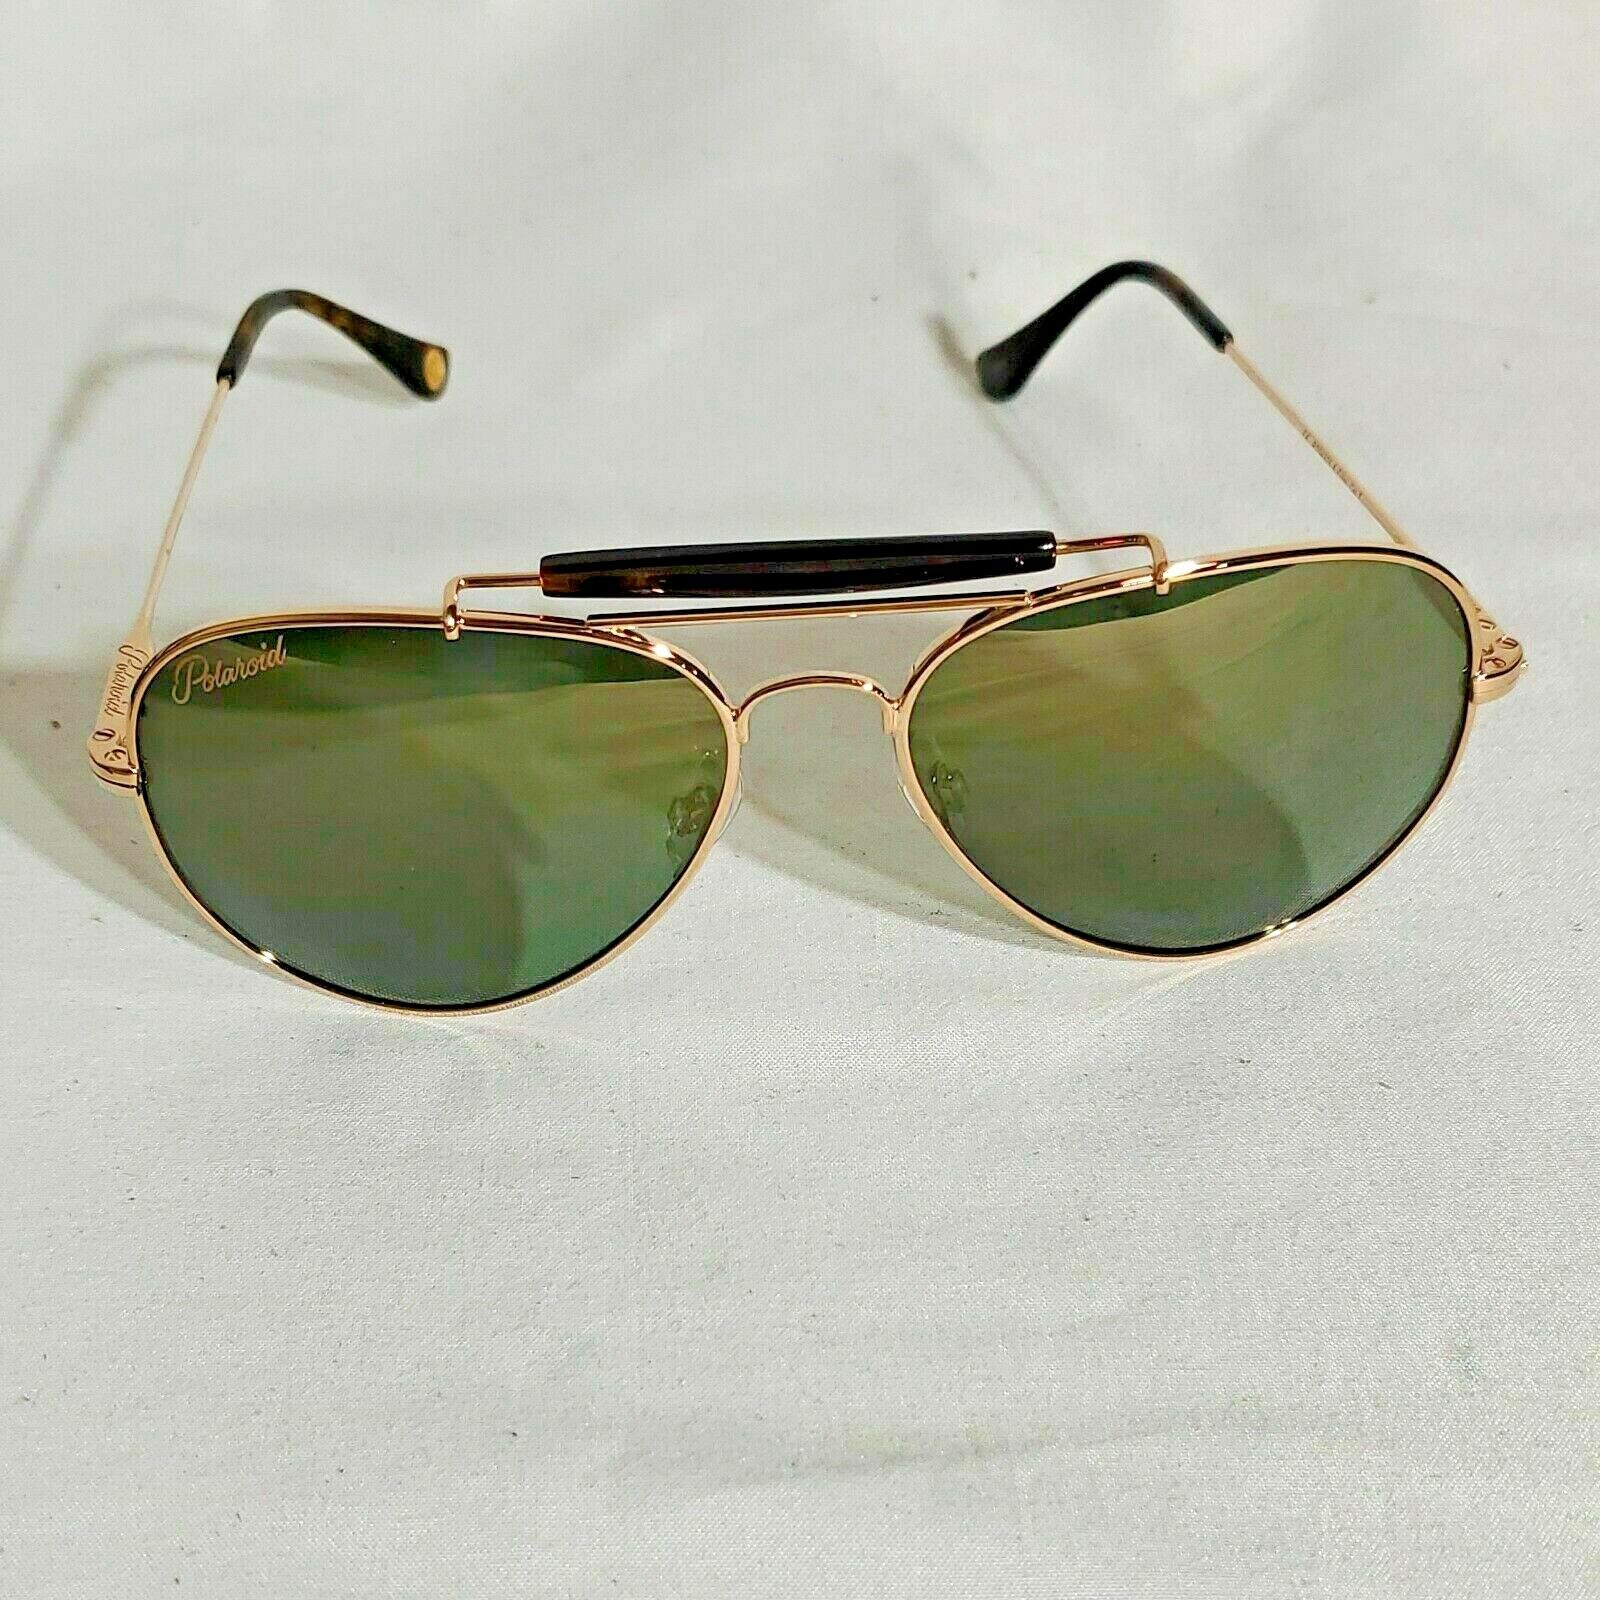 Polaroid Sunglasses 58MM - image 5